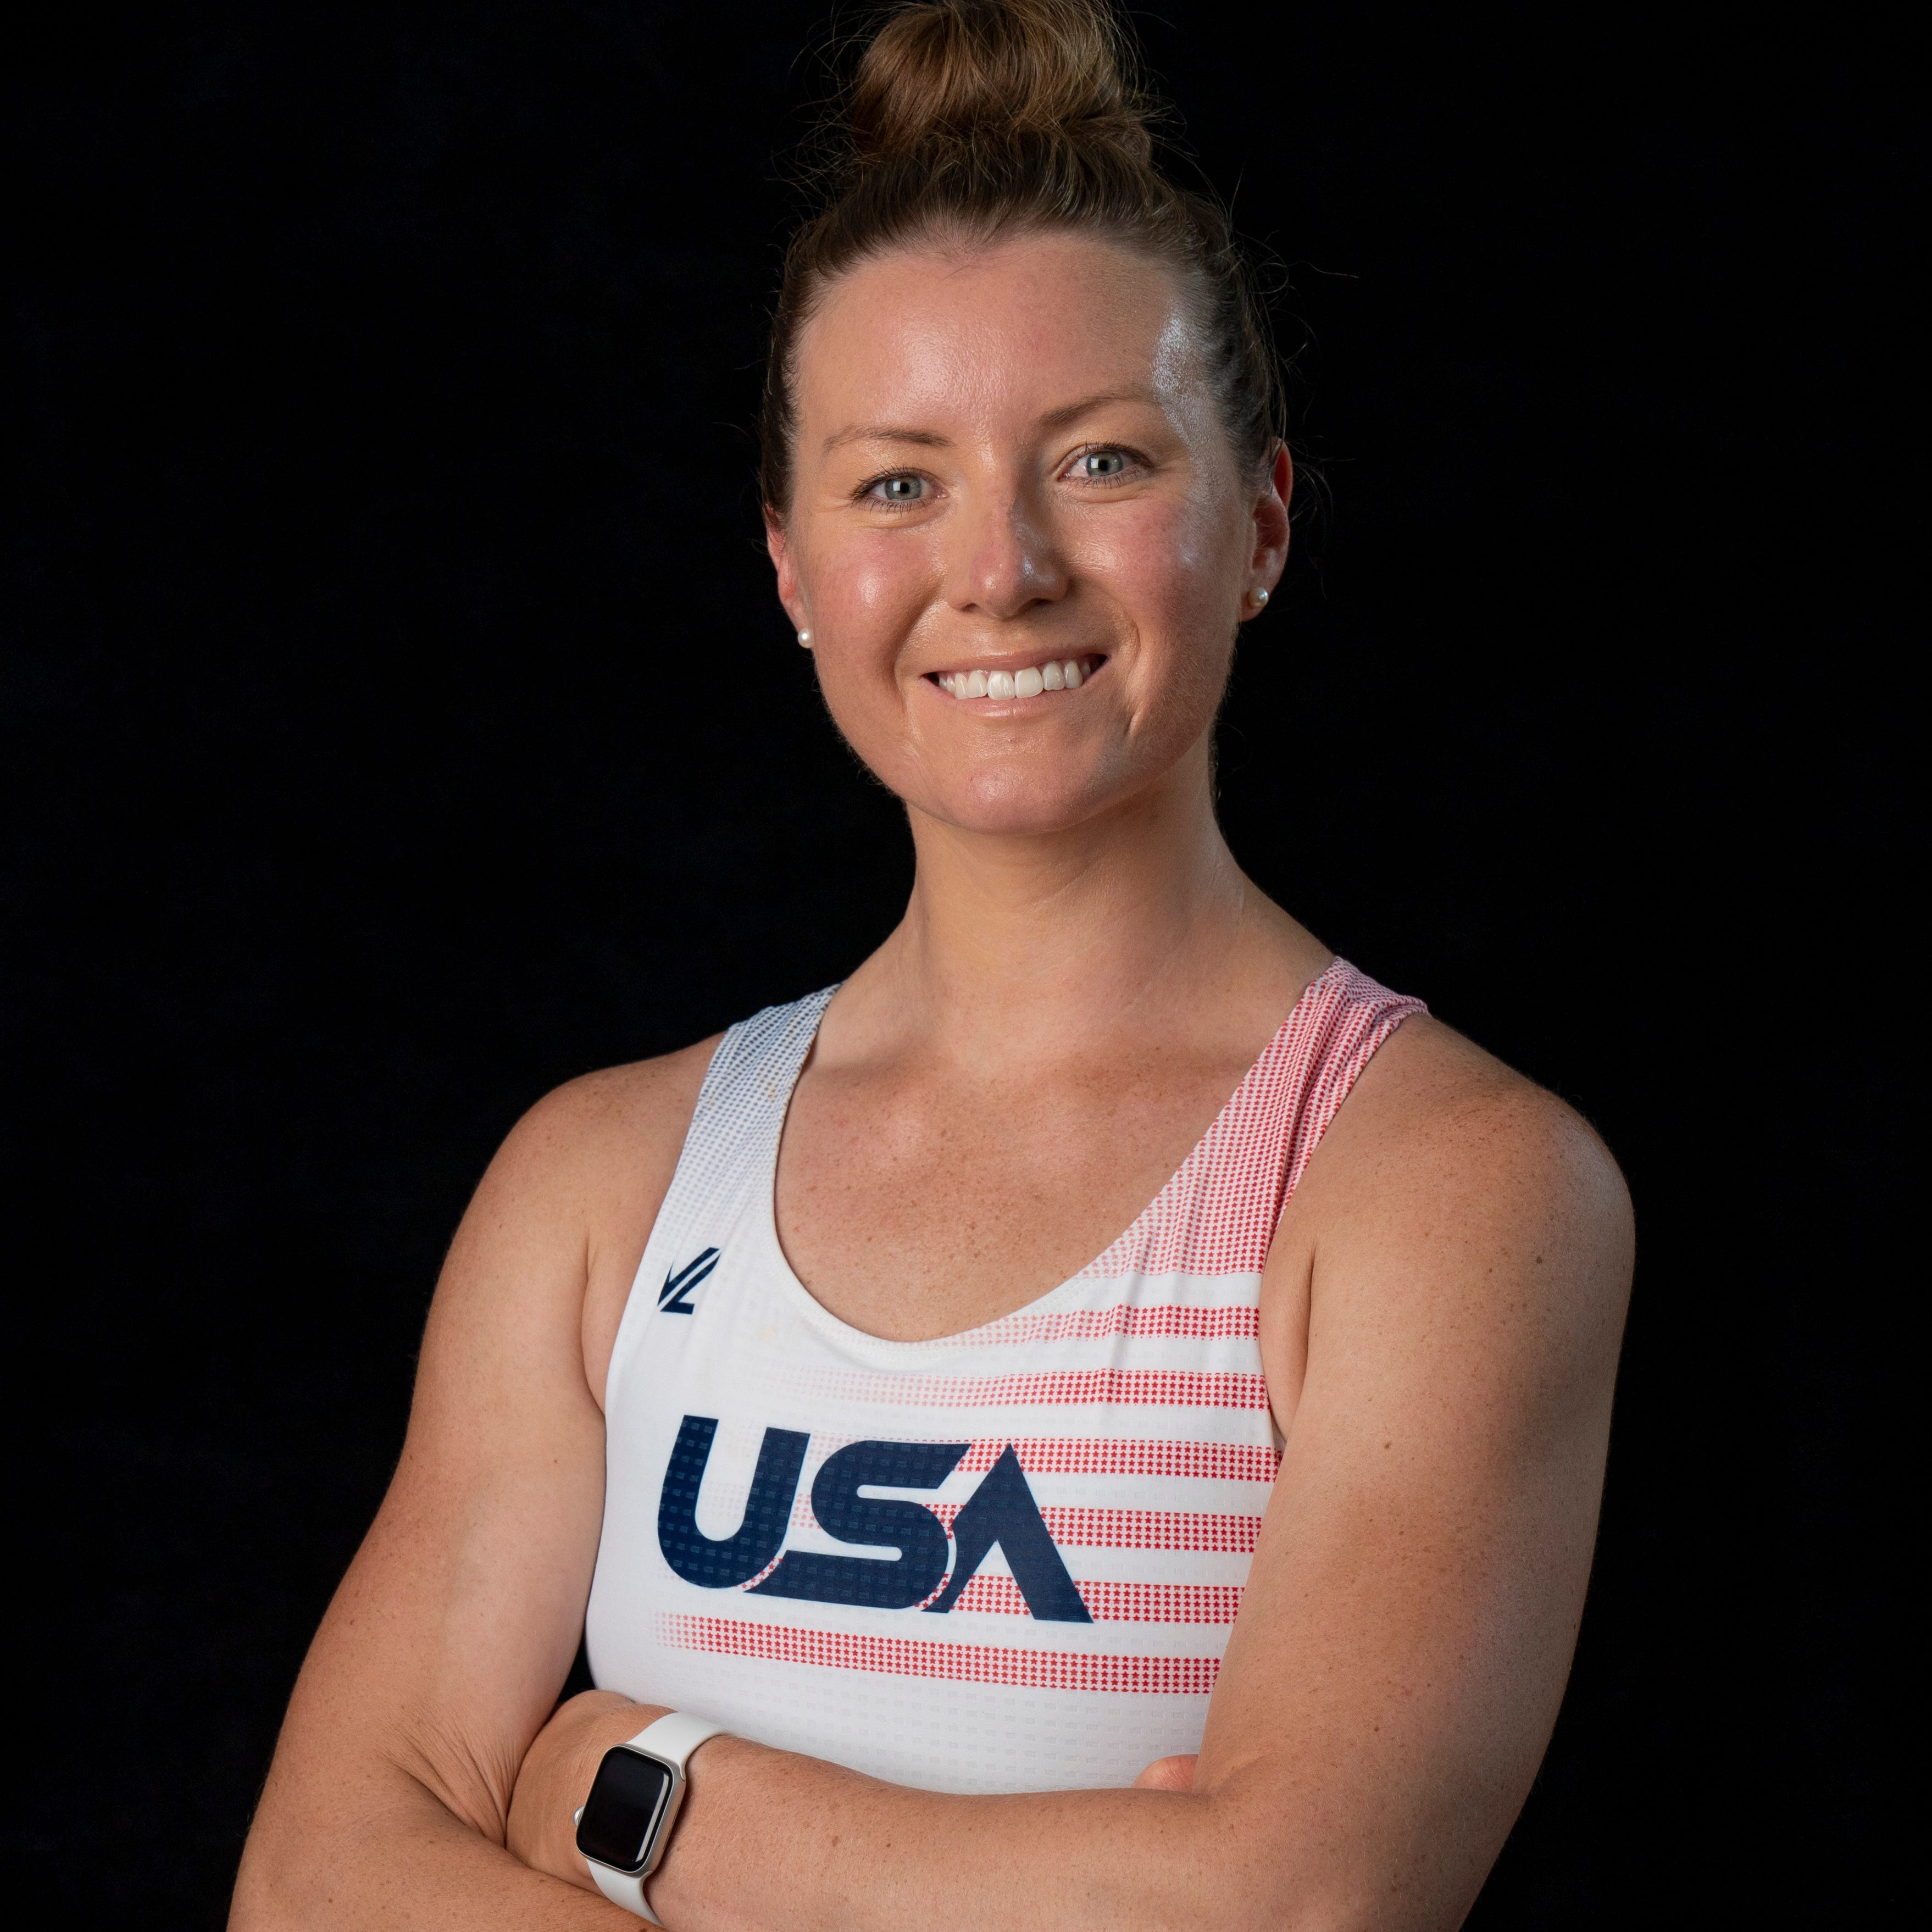 Kristine O'Brien